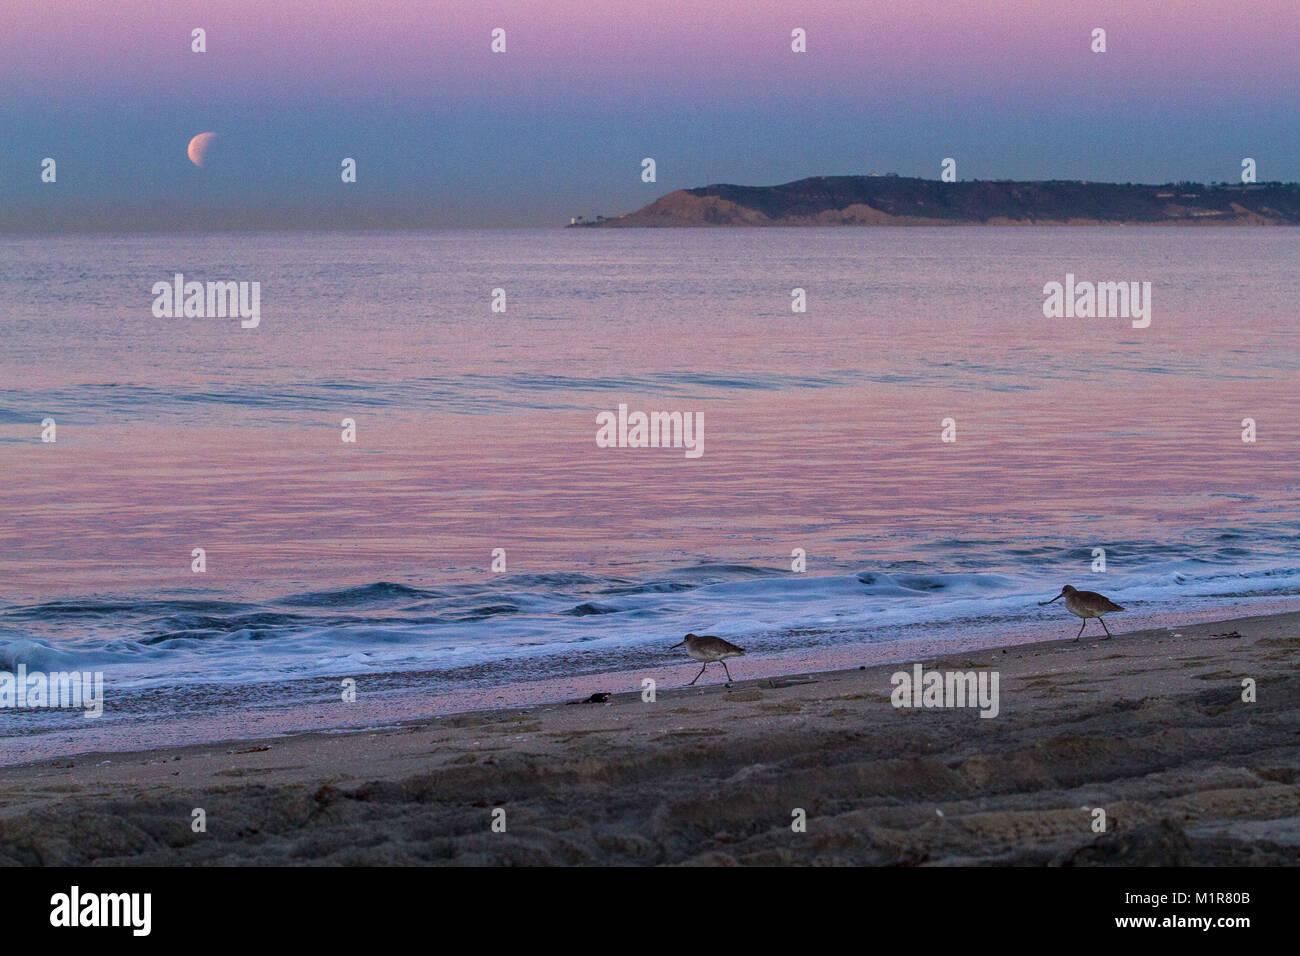 Coronado, California, USA. 31st Jan, 2018. The Rare Trifecta occurred early this morning. We had a Super, Blue, Stock Photo